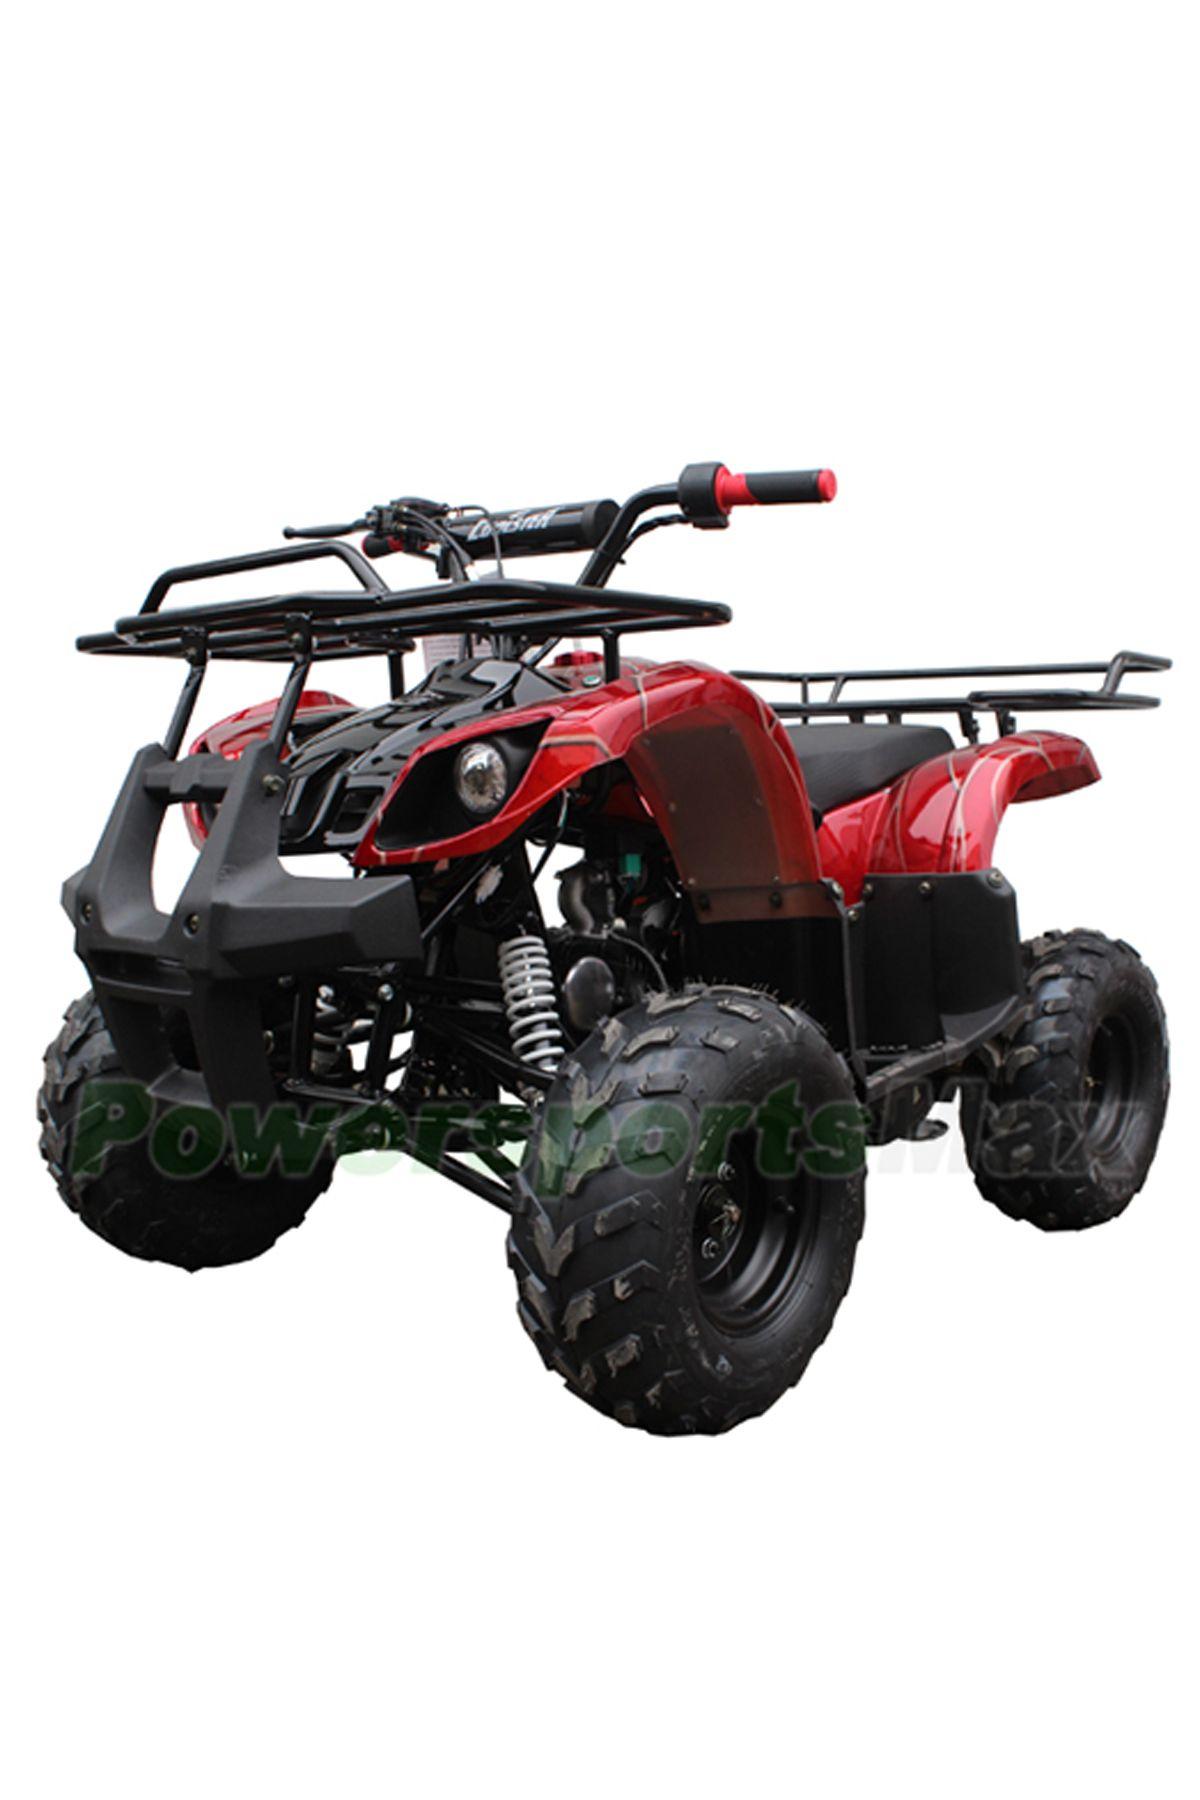 ATV-J012 Coolster ATV-3125R 125cc ATV with Automatic